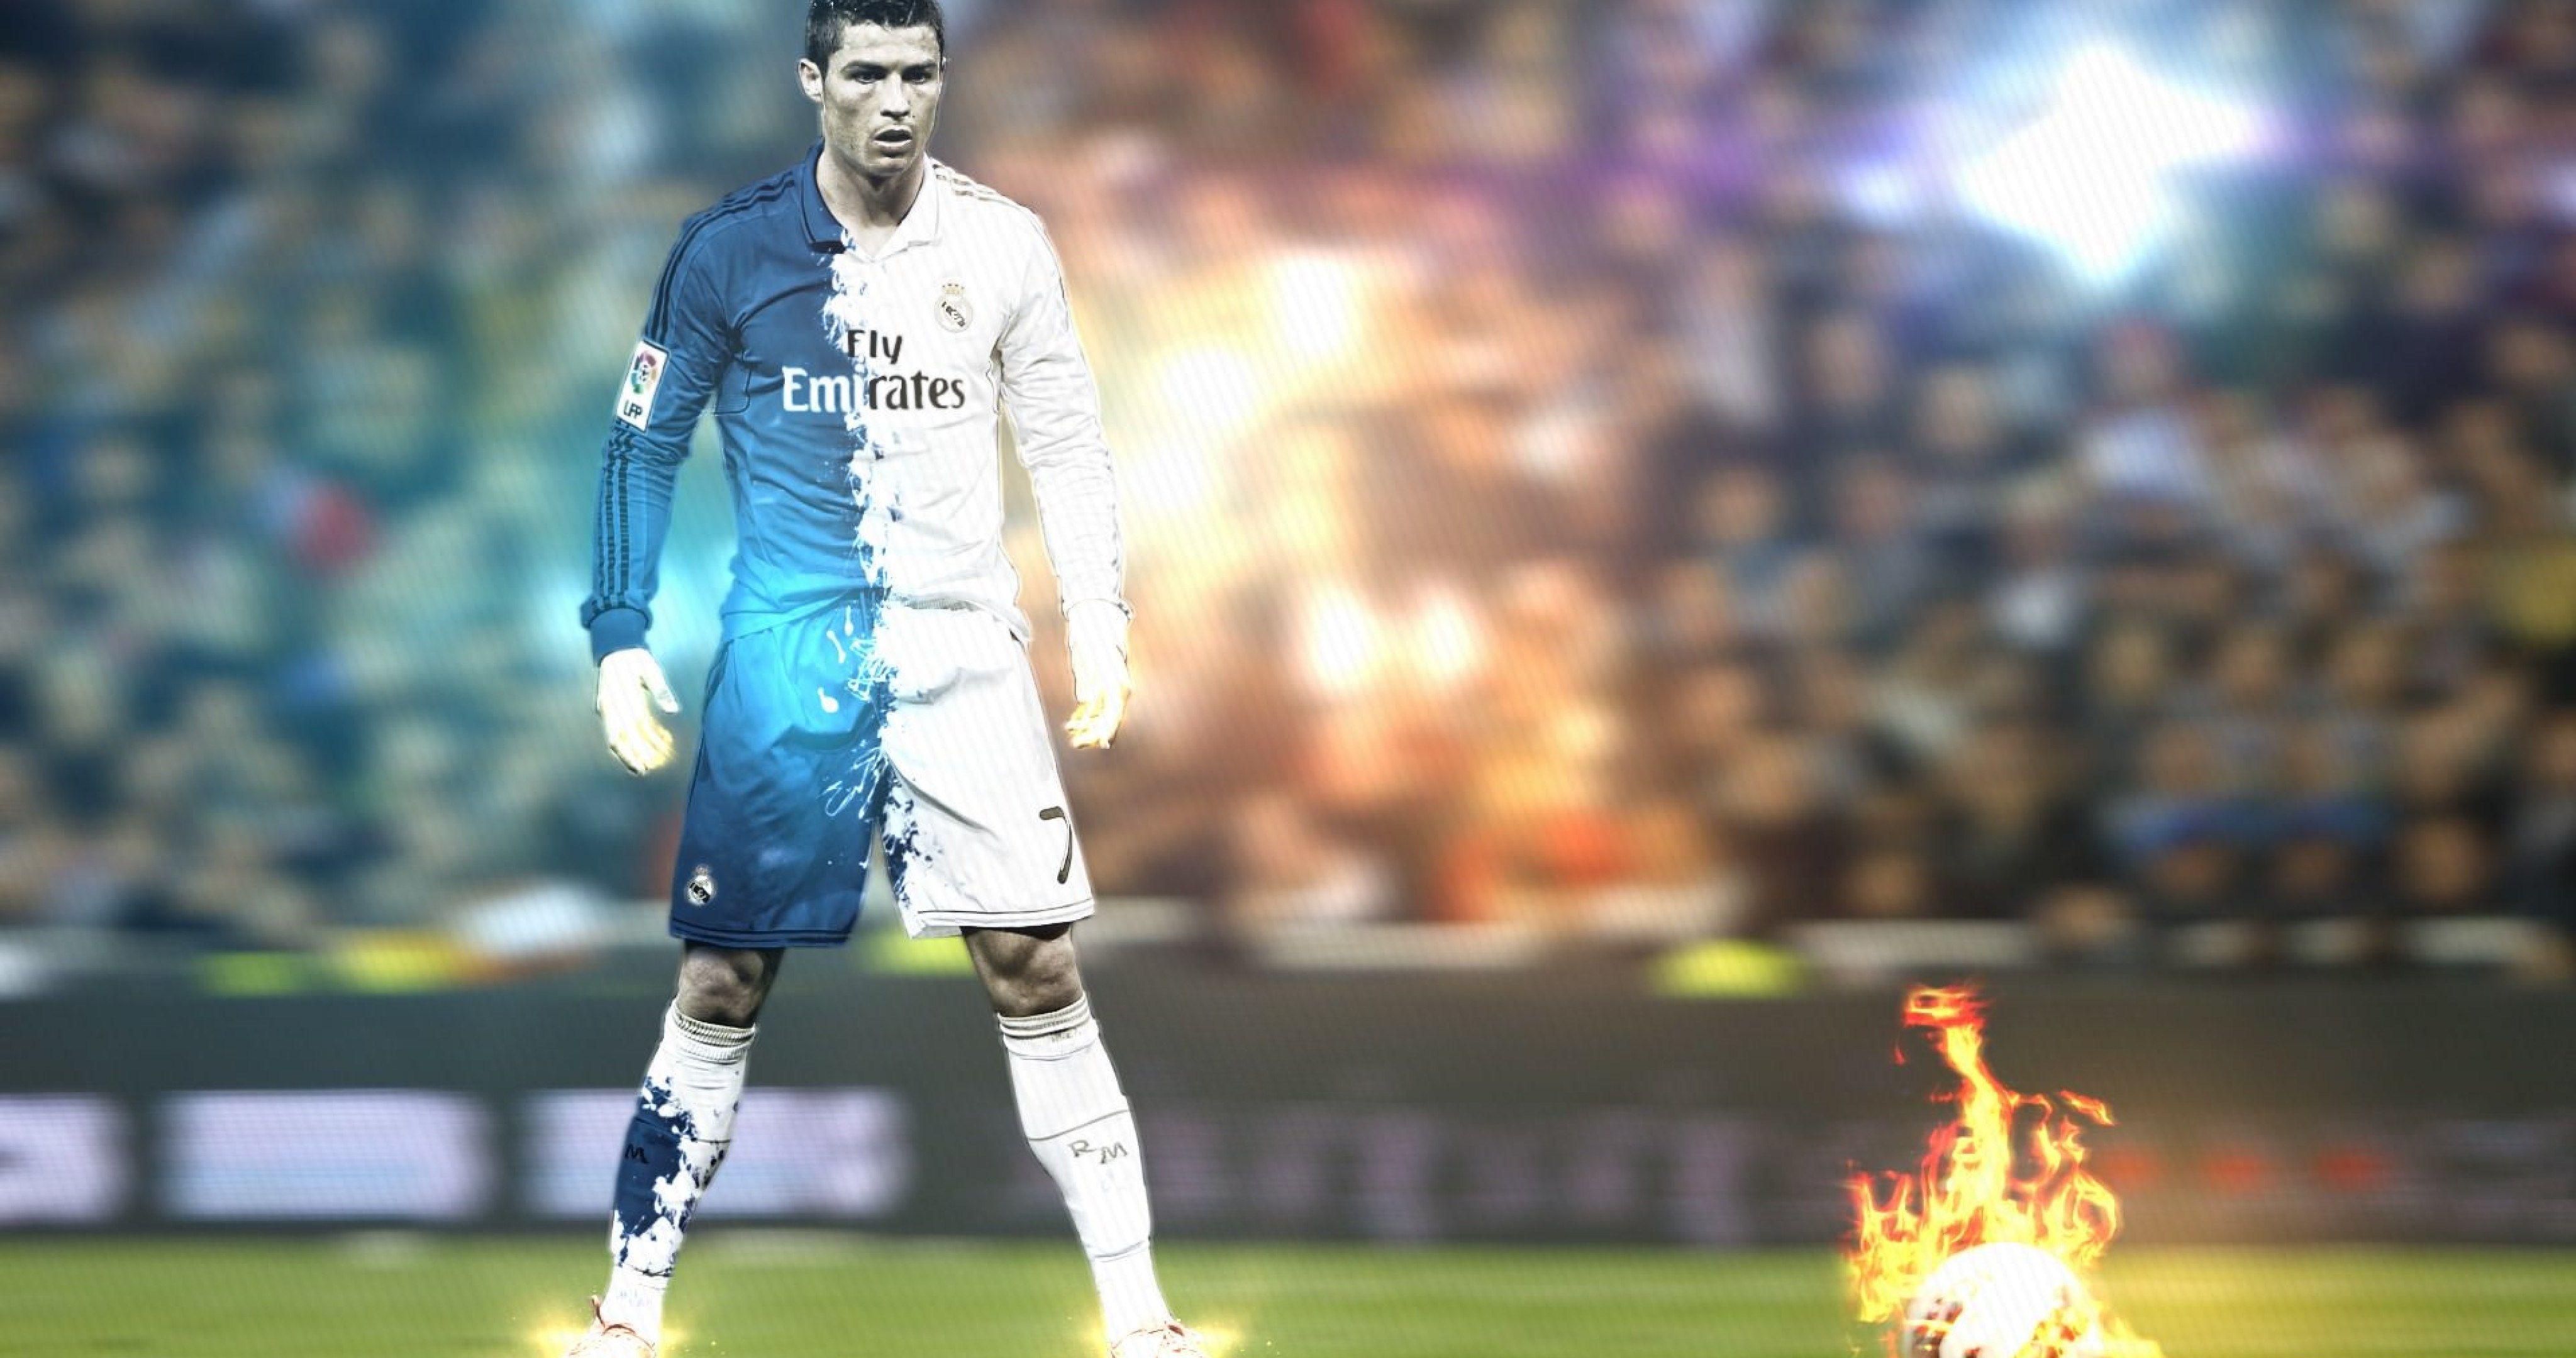 Cristiano Ronaldo Desktop Wallpapers Top Free Cristiano Ronaldo Desktop Backgrounds Wallpaperaccess